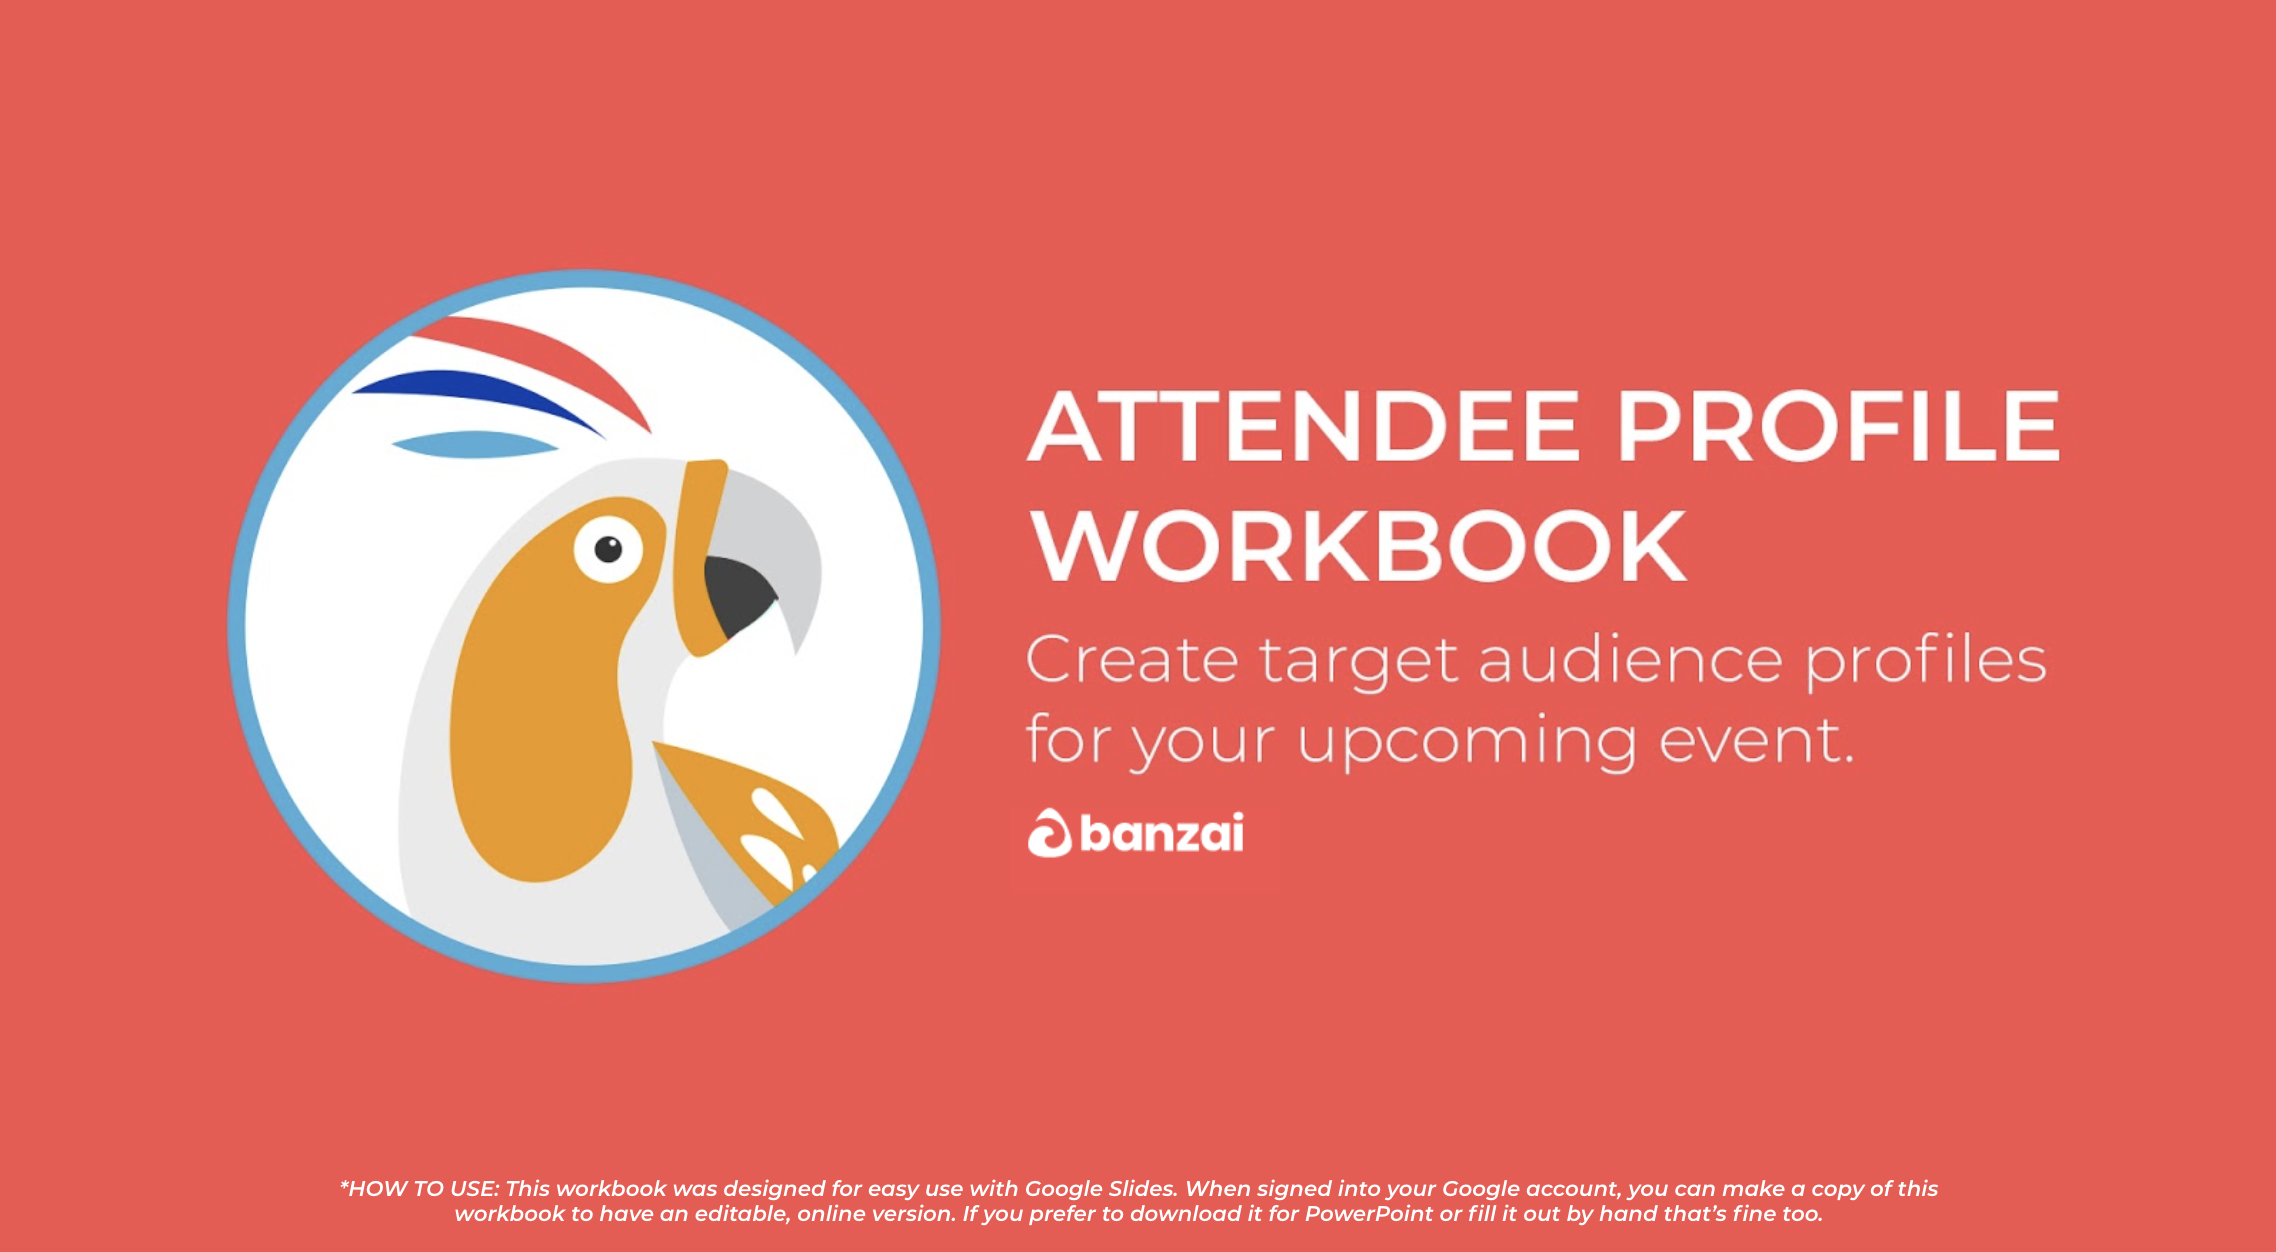 Attendee Profile Workbook